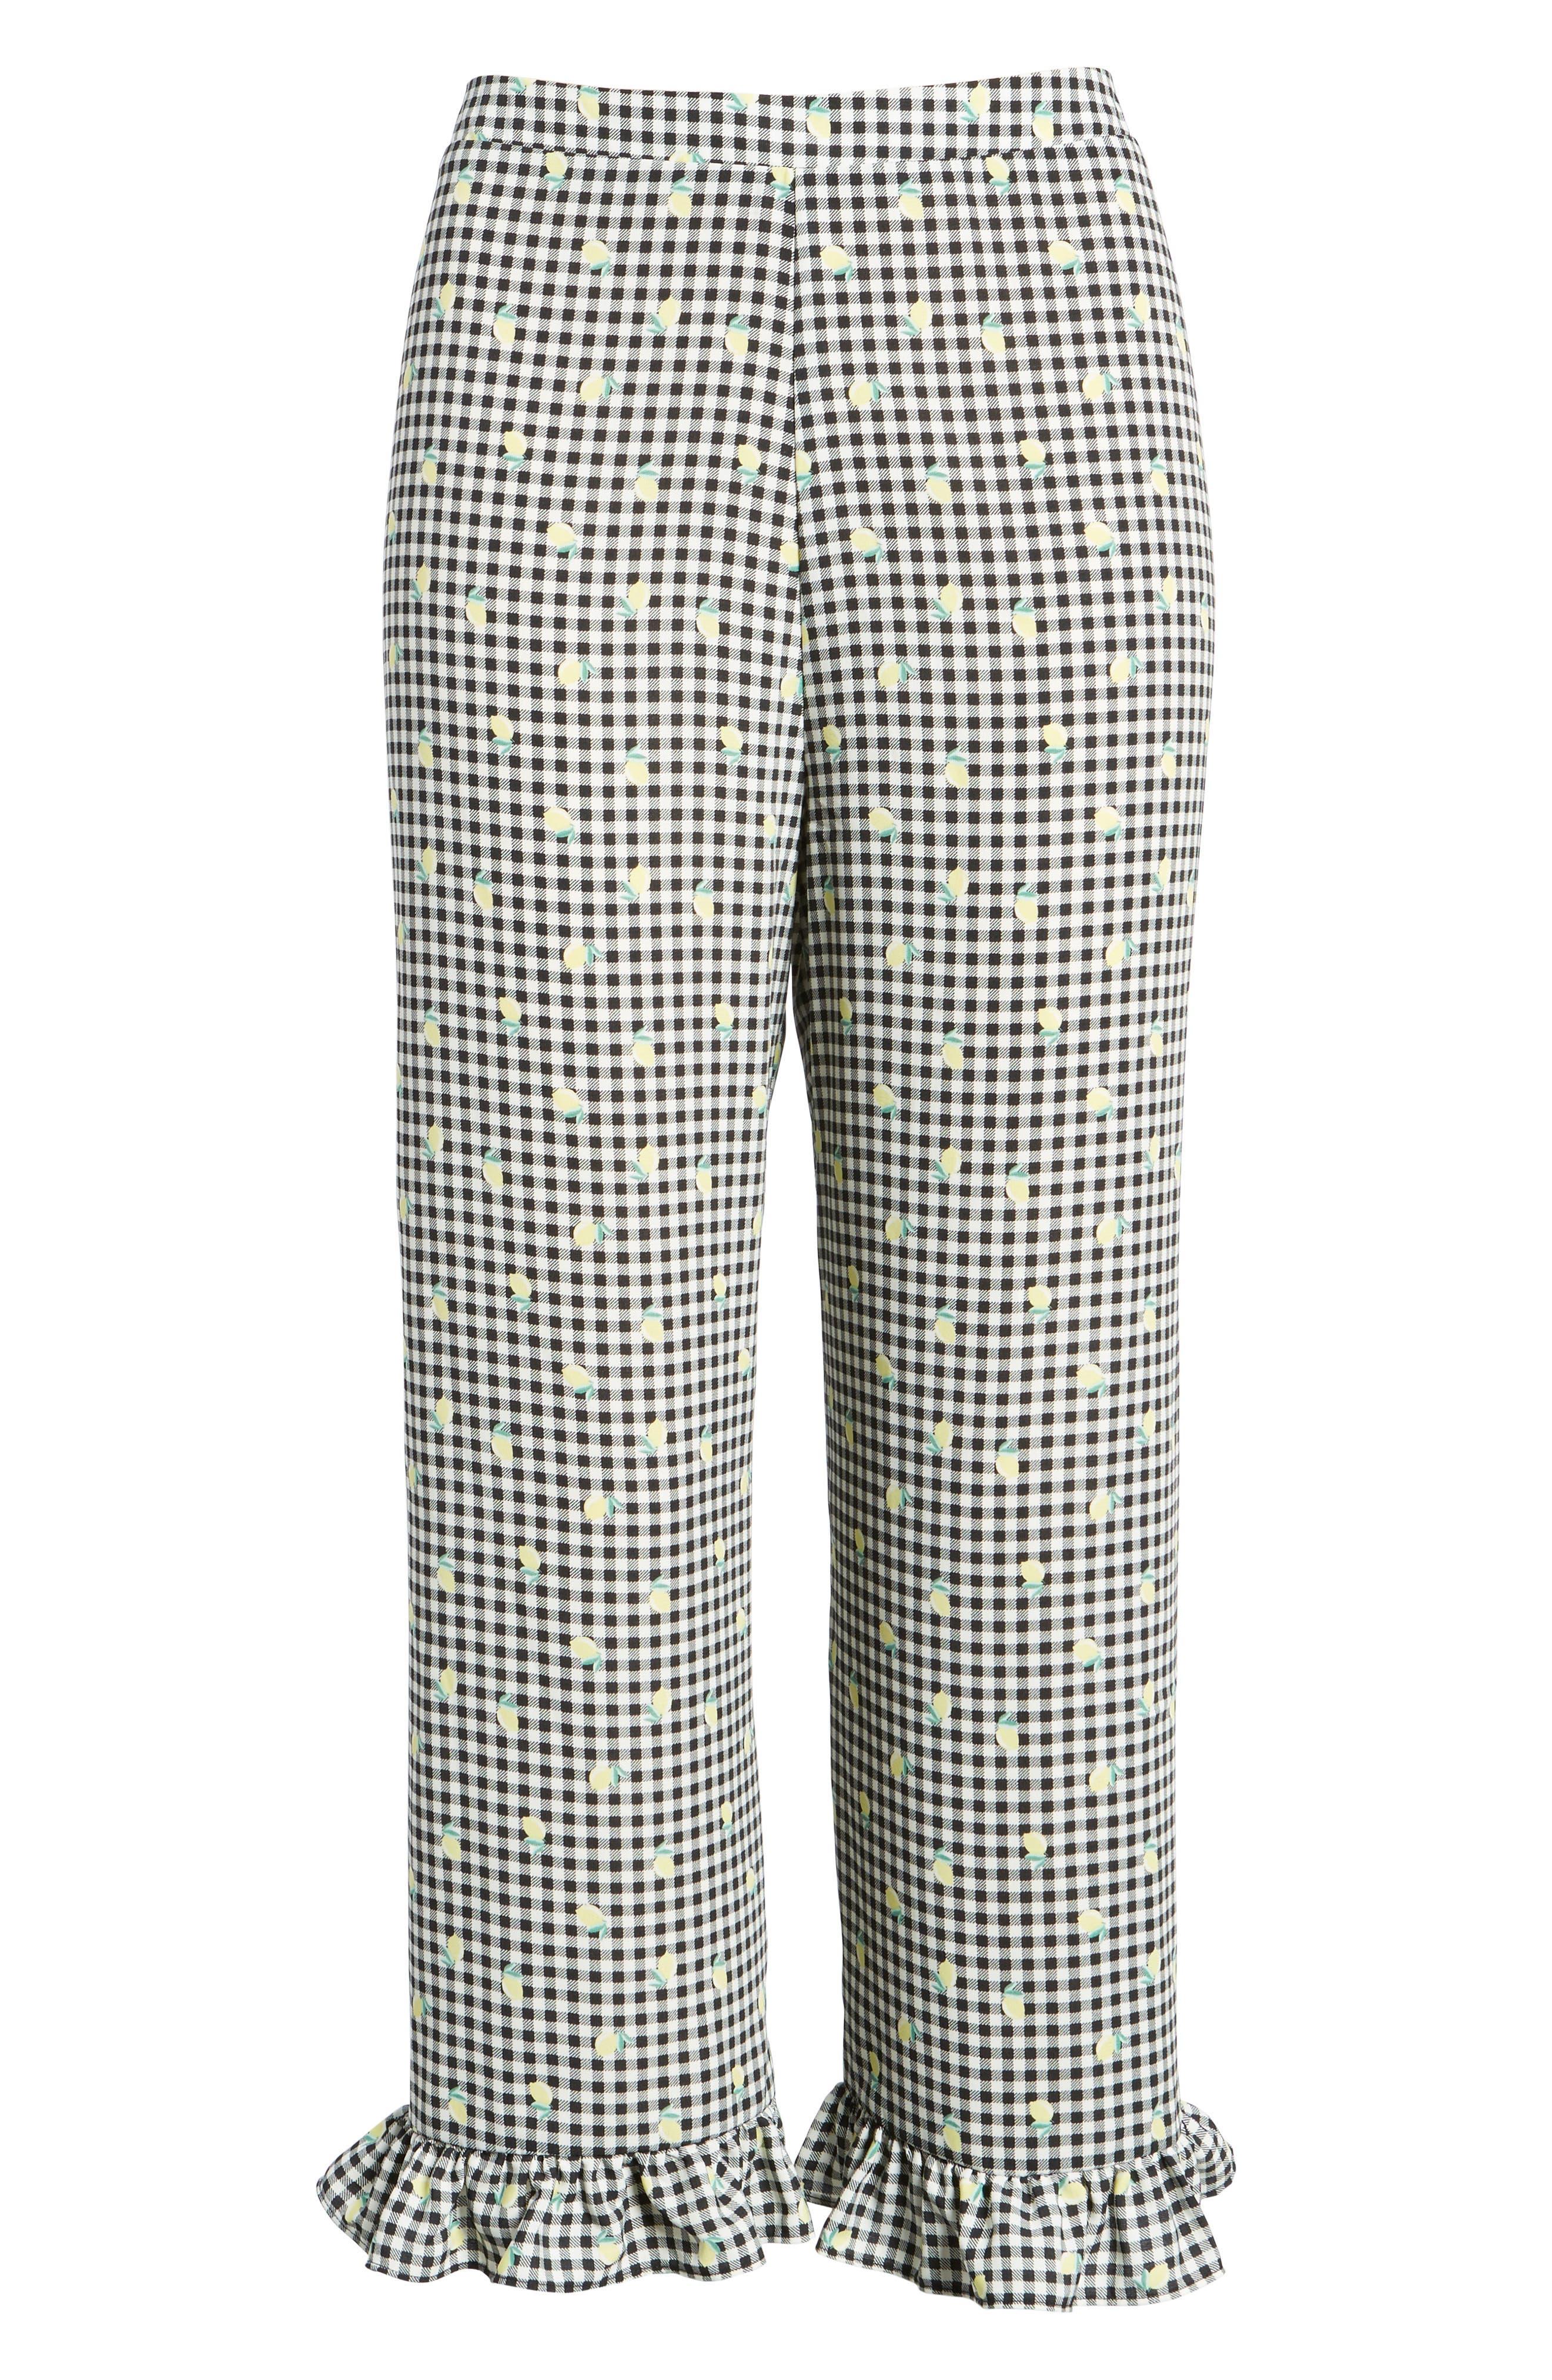 Gingham Ruffle Hem Crop Pants,                             Alternate thumbnail 8, color,                             Gingham Lemon Print